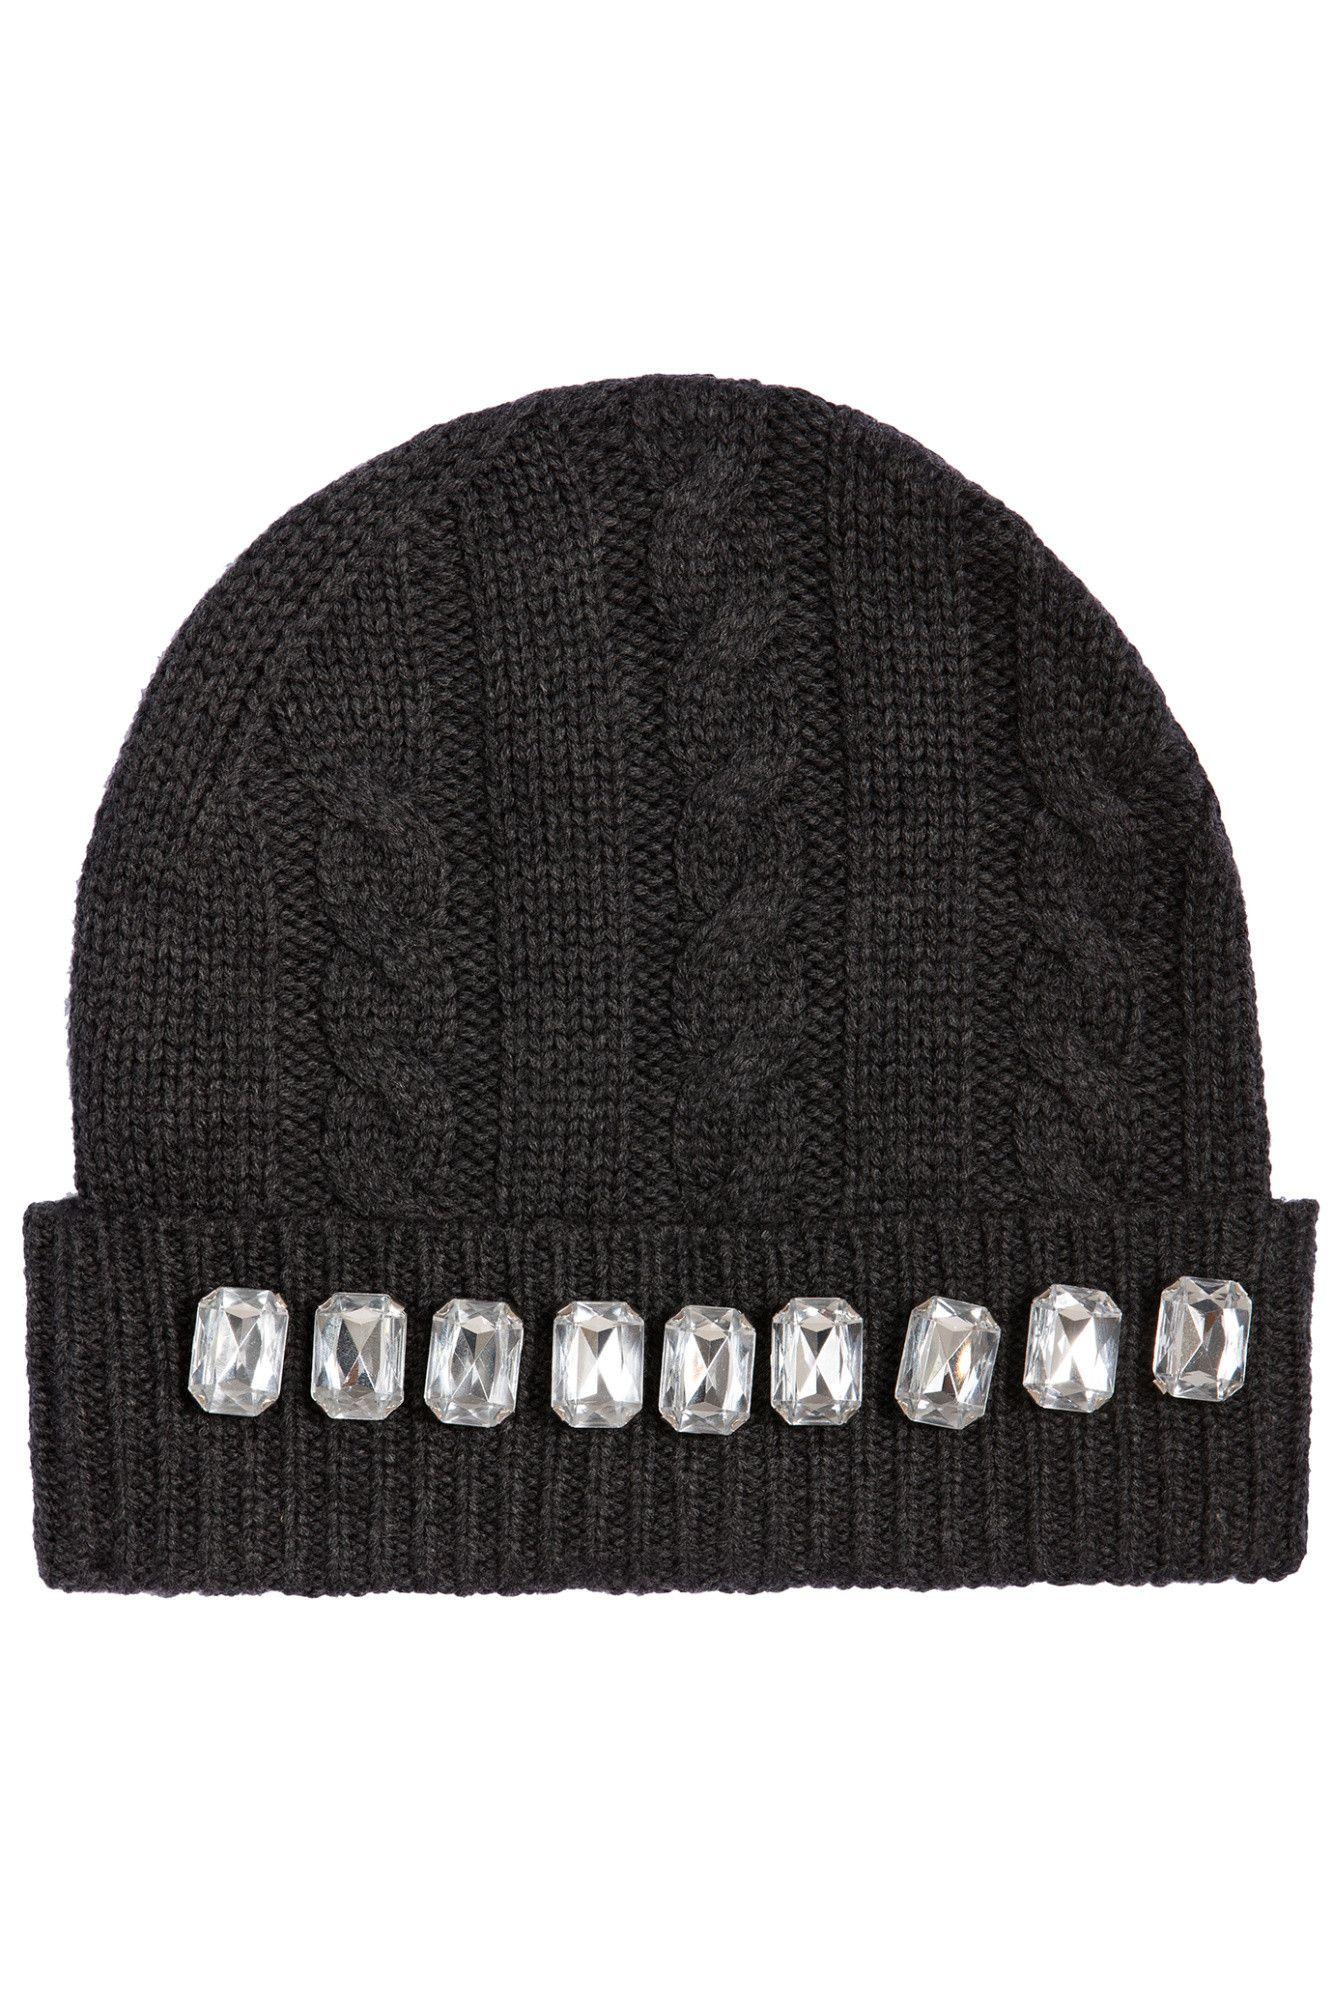 2f9da9892dc Cable Knit Jewel Beanie Hat